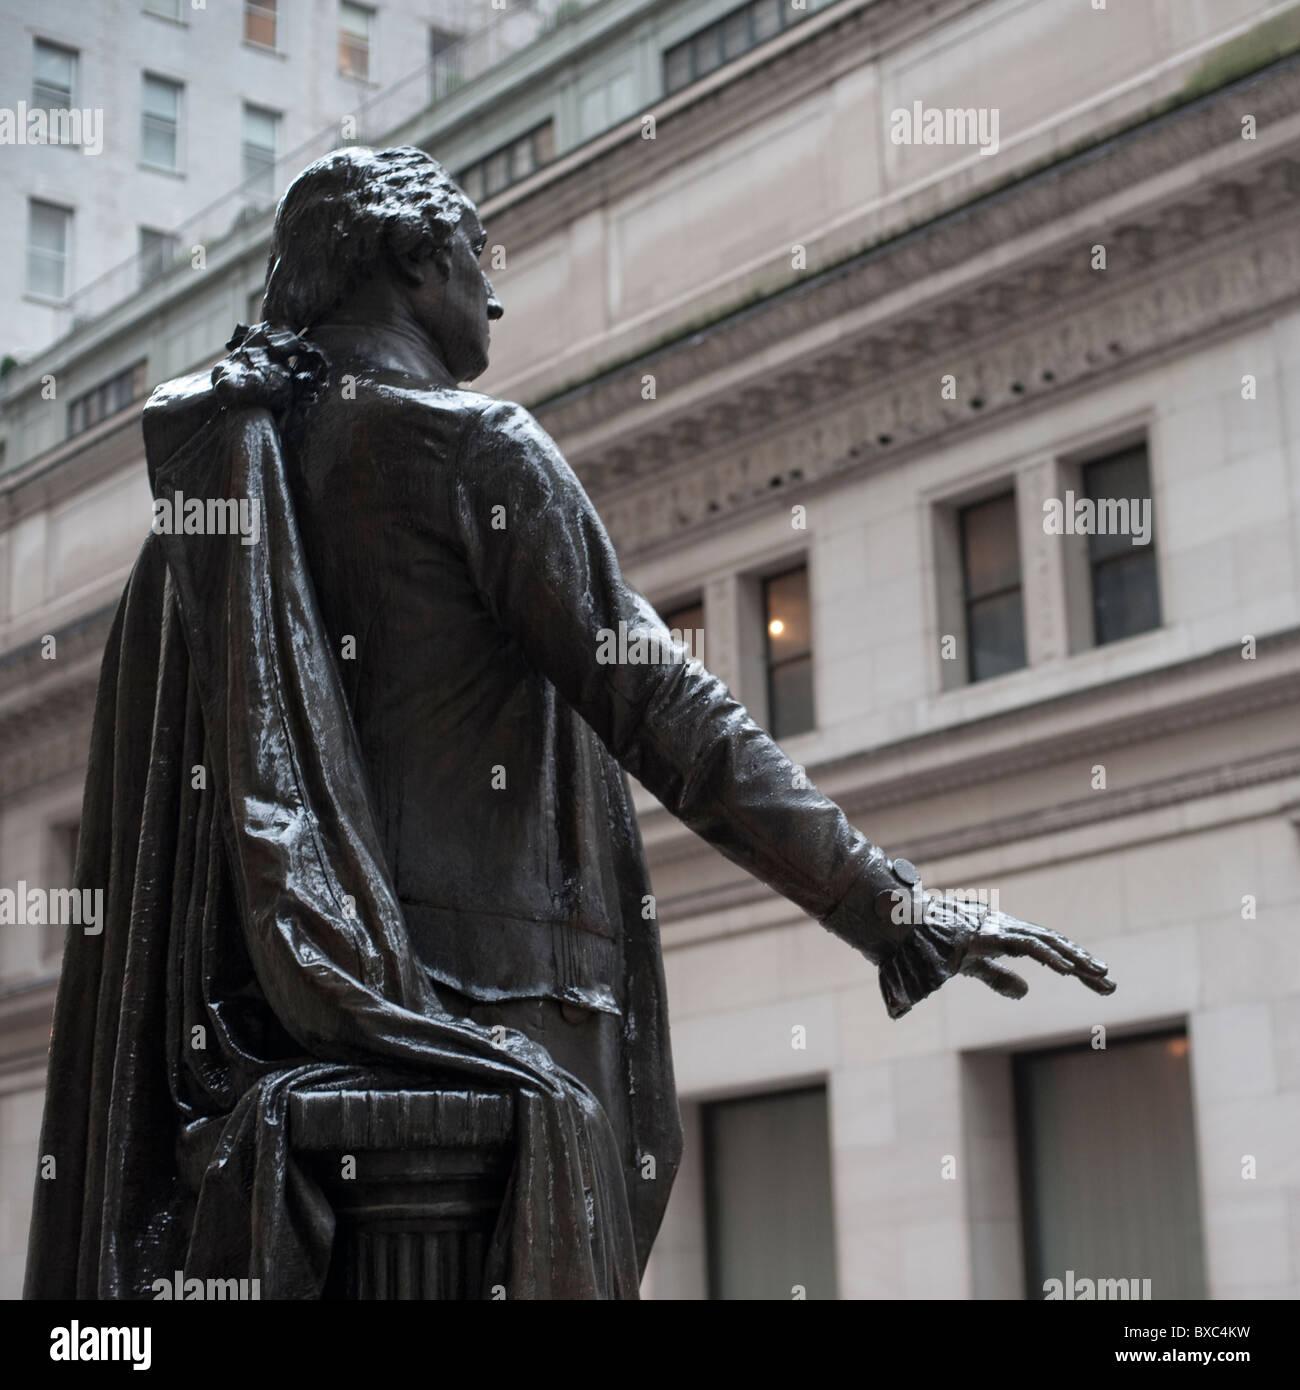 George Washington Statue in Manhattan, New York City, U.S.A. - Stock Image